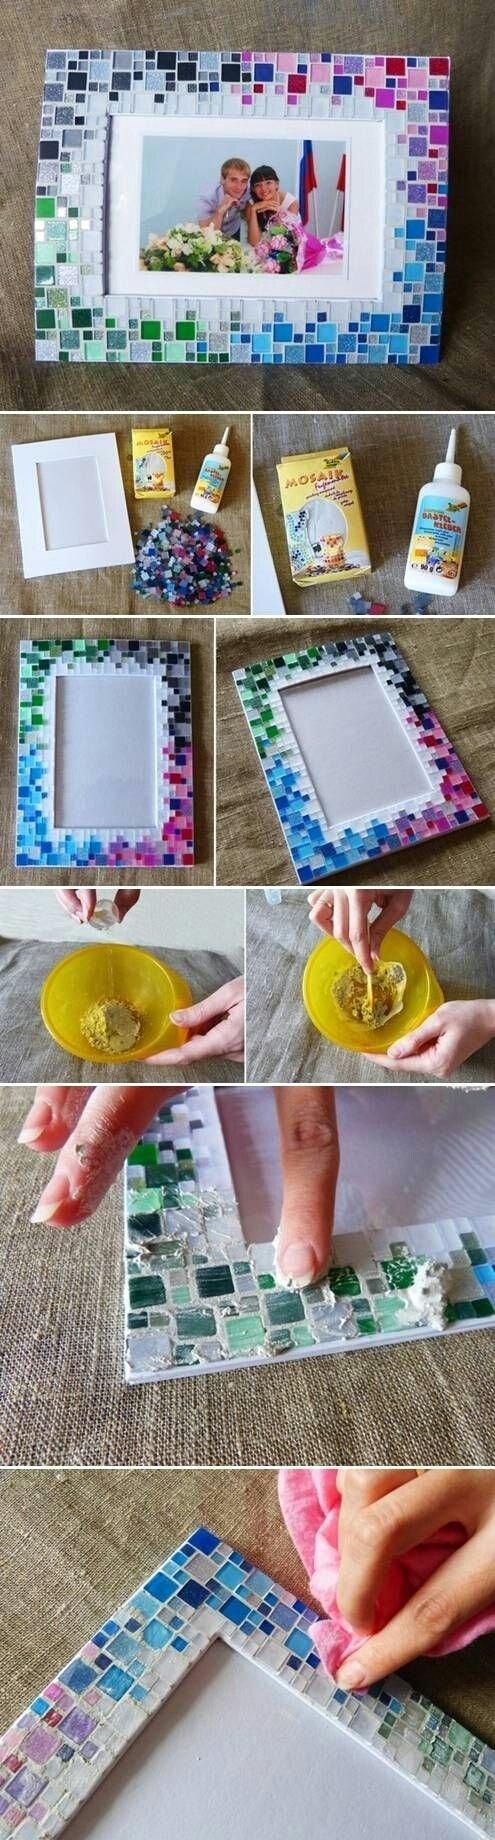 Selbstgemachter Mosaik-Bilderrahmen | töpfern | Pinterest ...